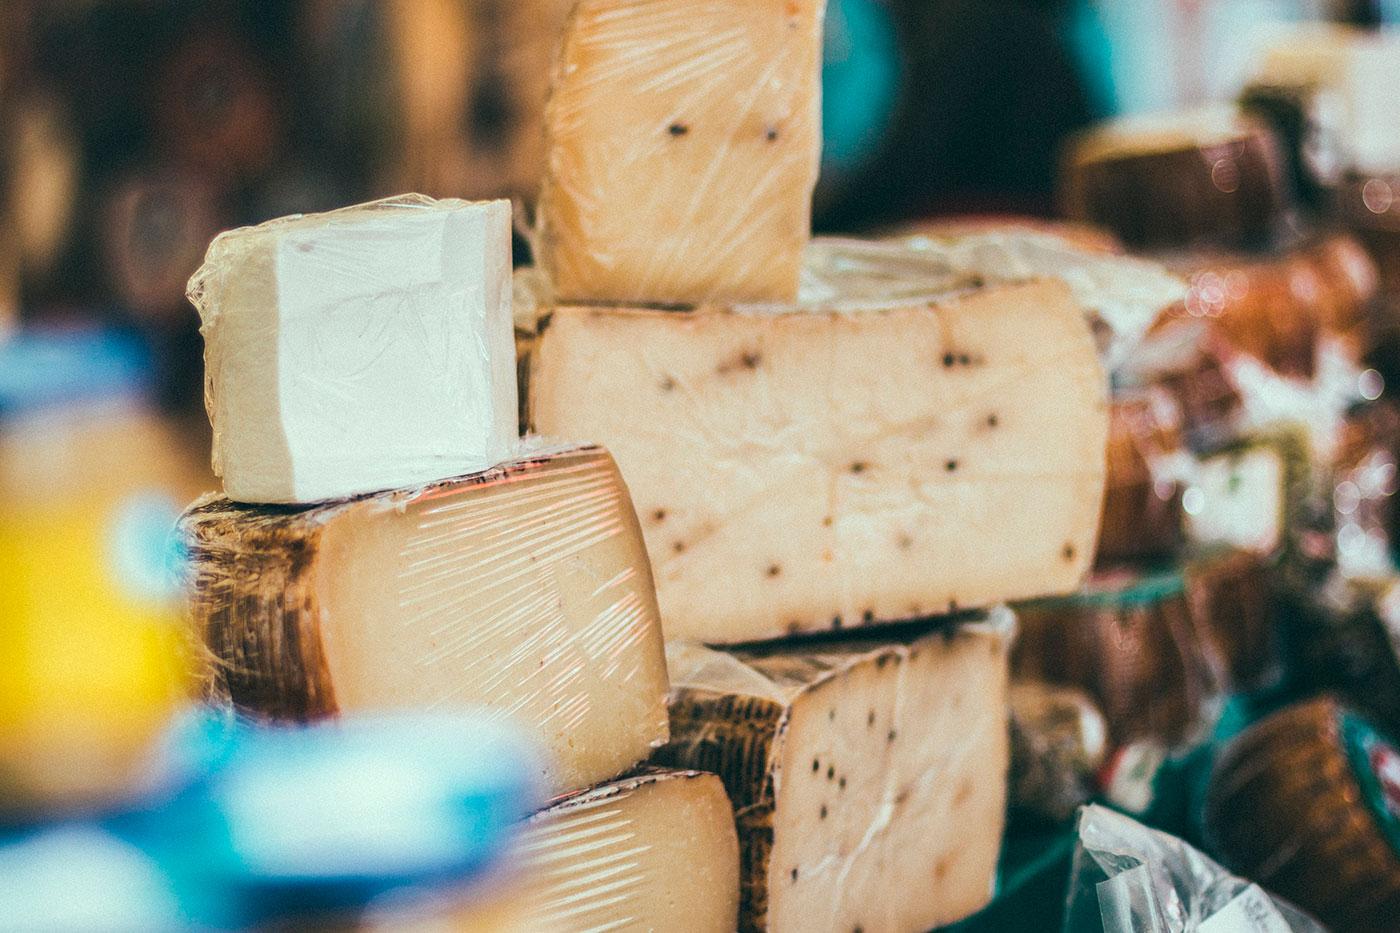 cheese-923922